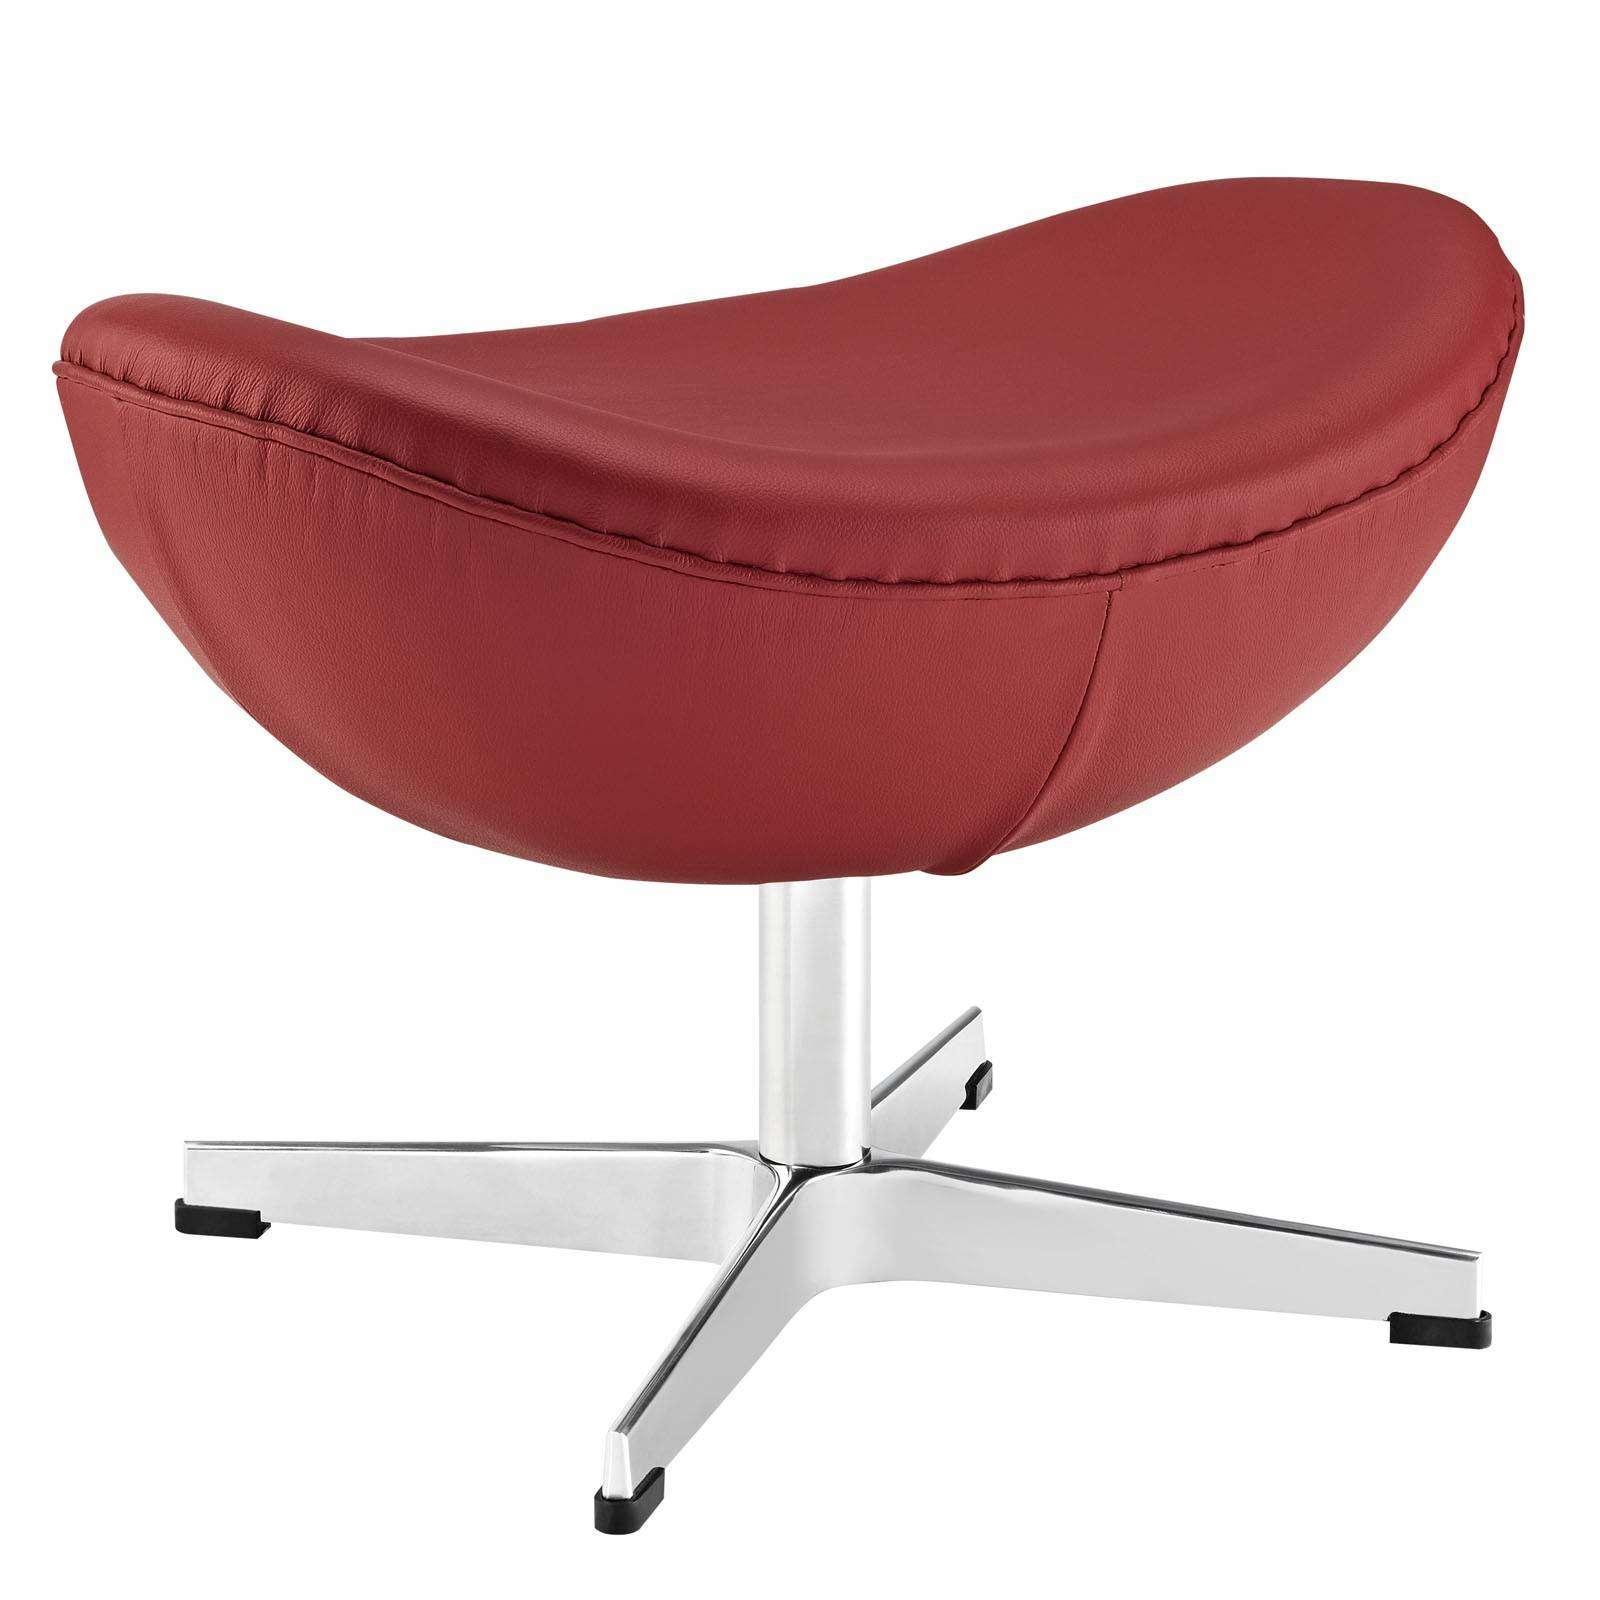 arne jacobsen ottoman for egg chair leather